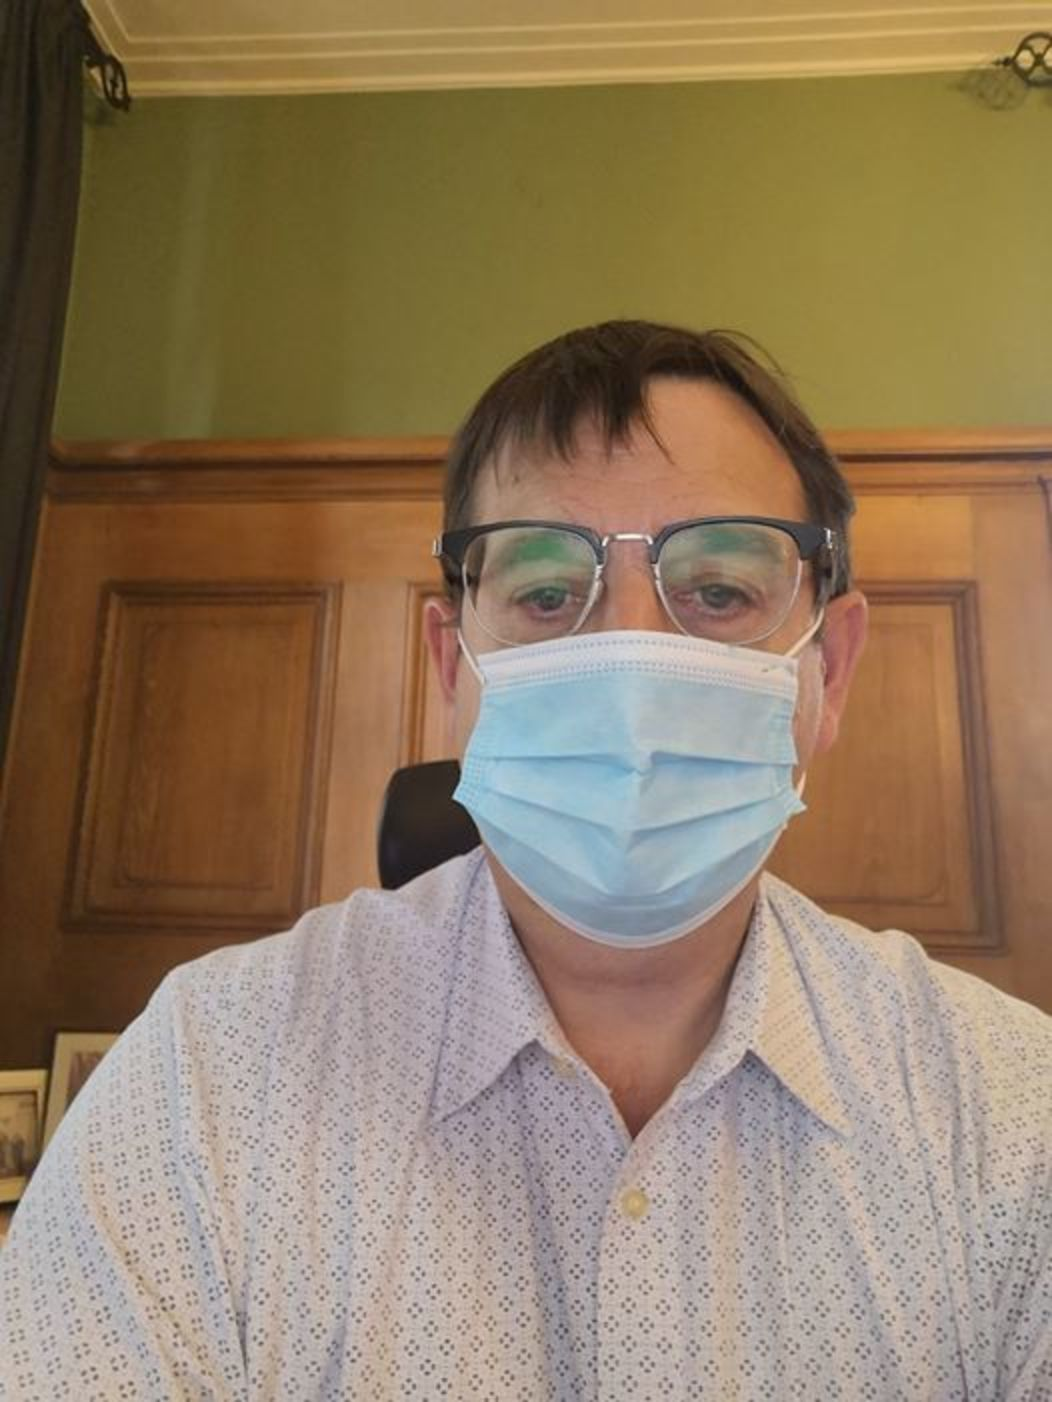 MUDEC Interim Executive Director Raymond Manes with mask